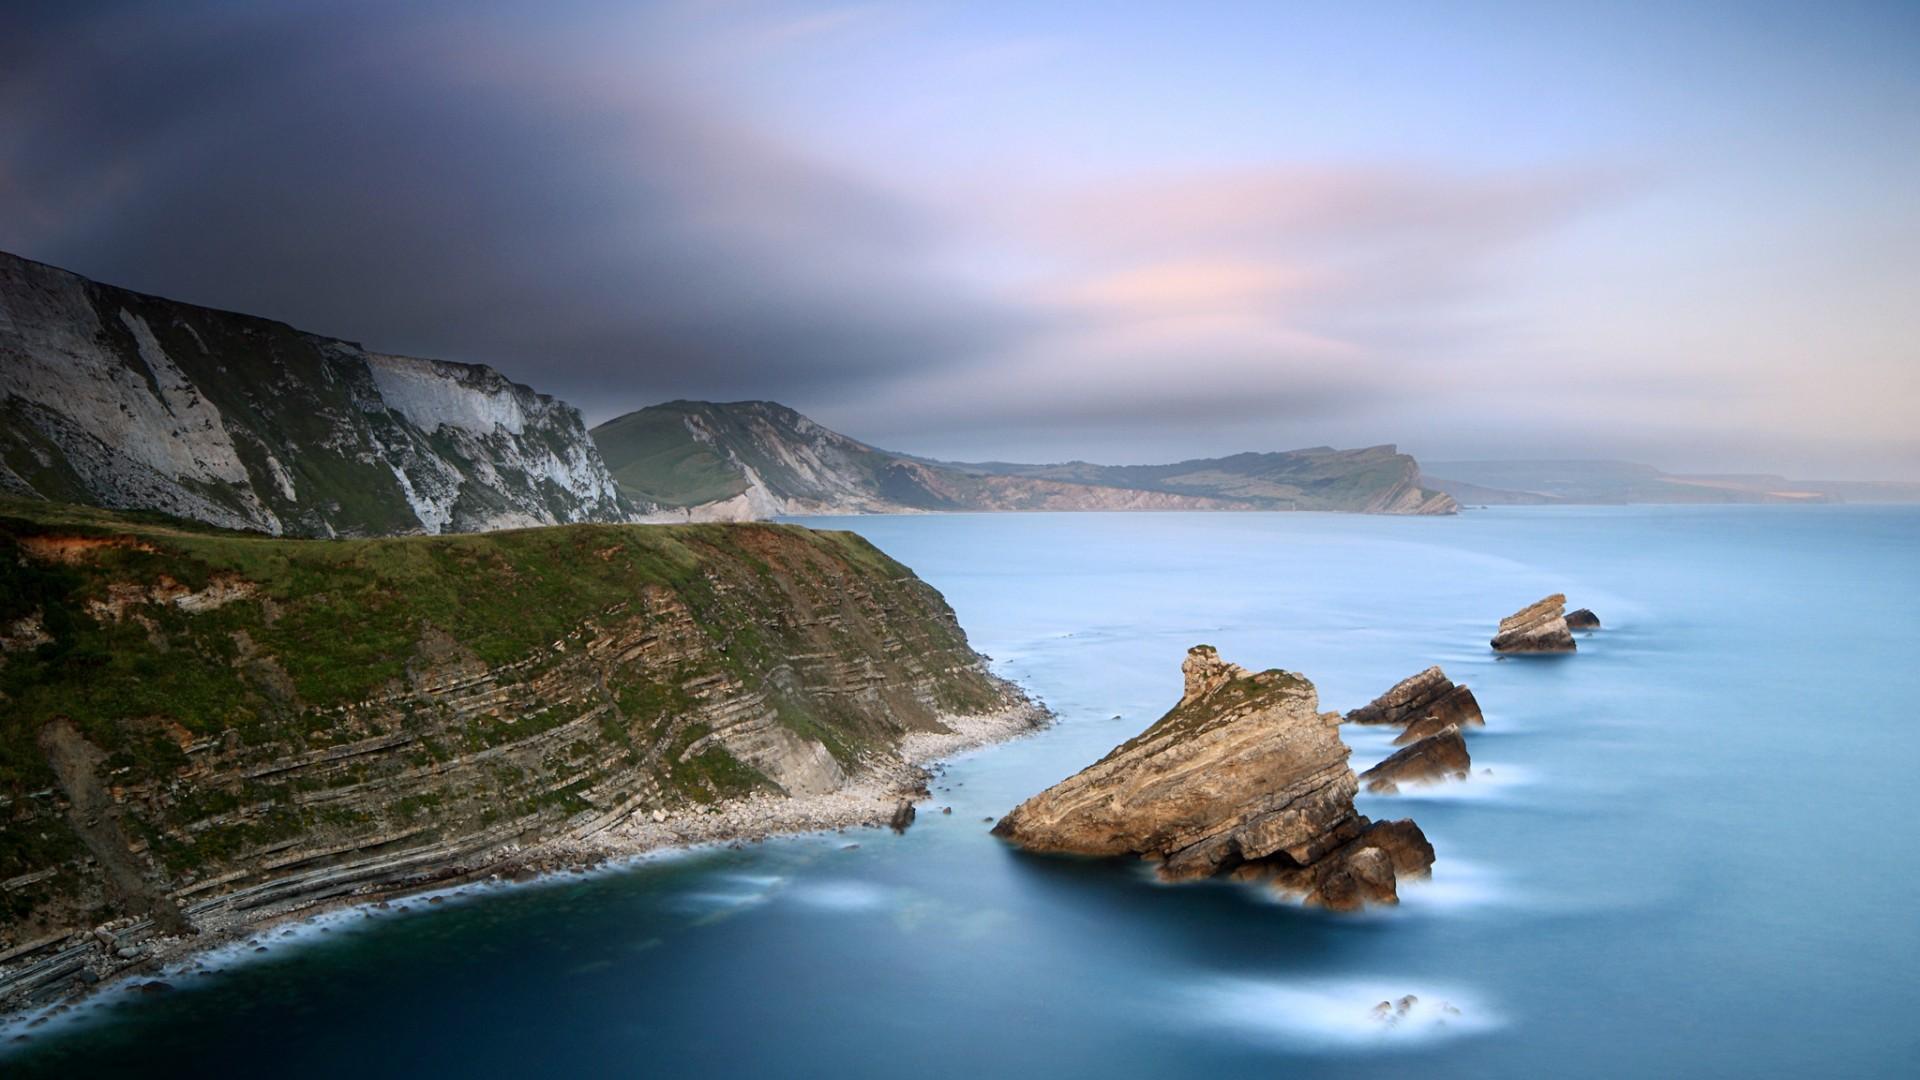 природа море скалы берег загрузить